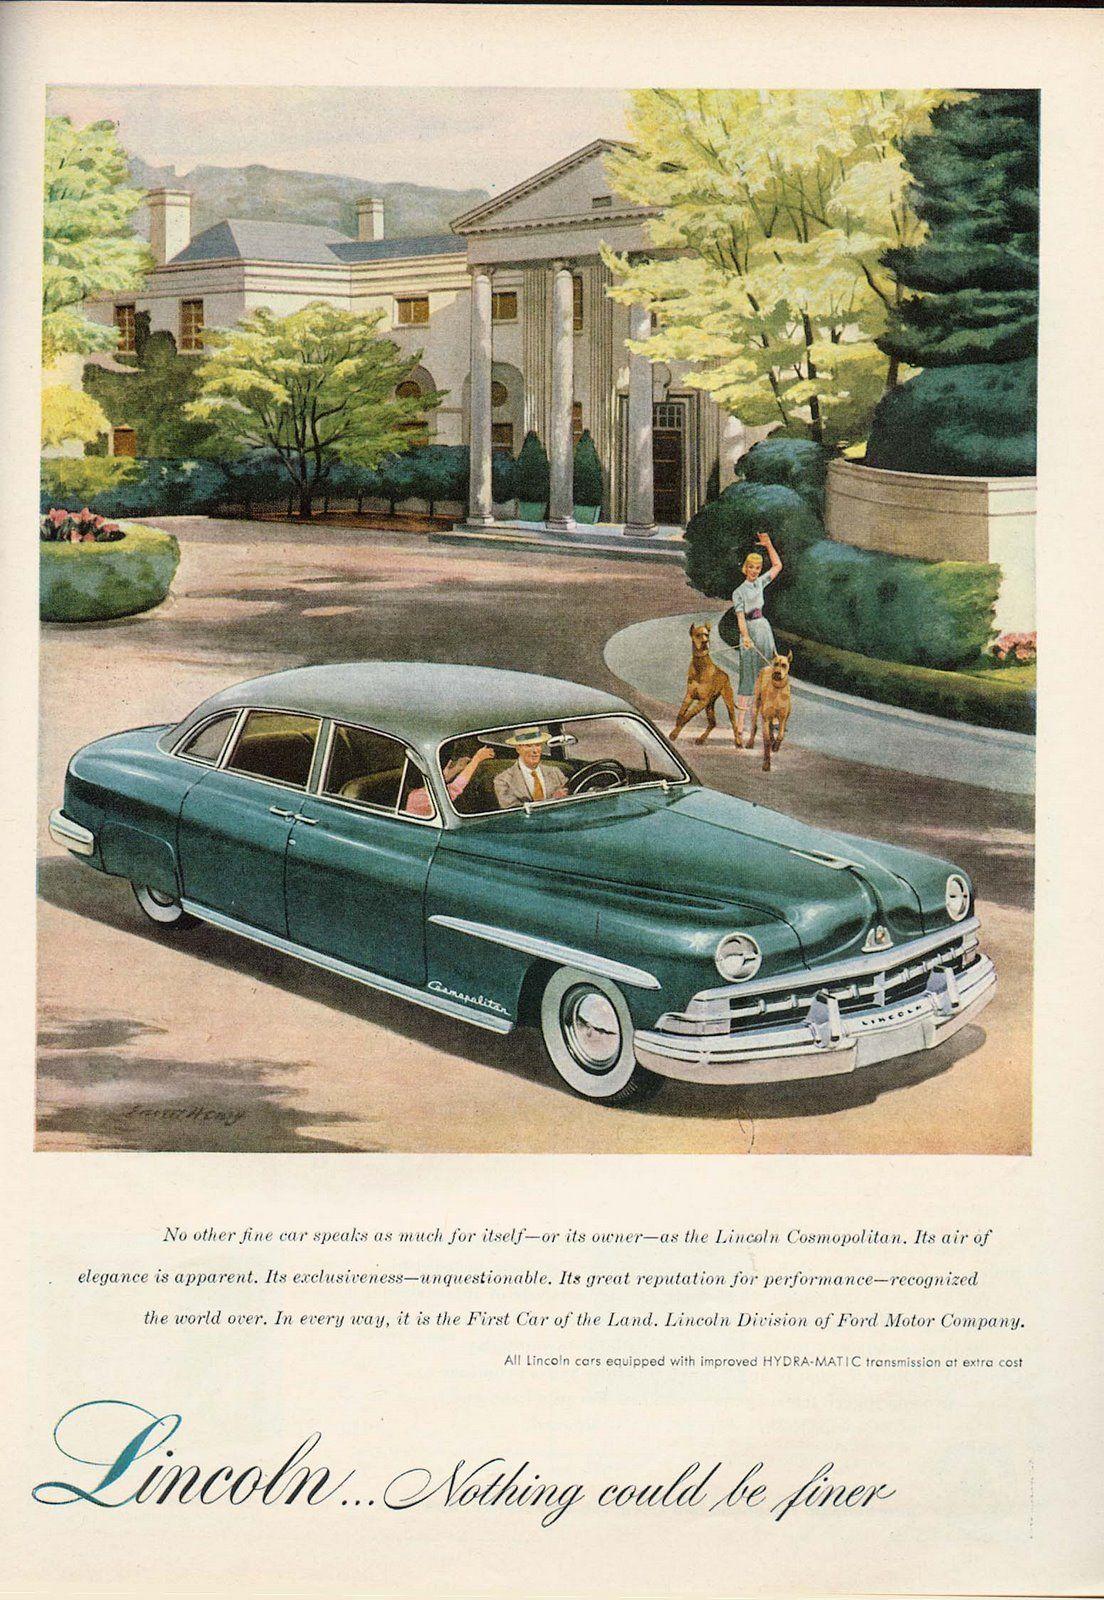 pingl par mars sur cars 39 drawings voiture automobile et voiture vintage. Black Bedroom Furniture Sets. Home Design Ideas